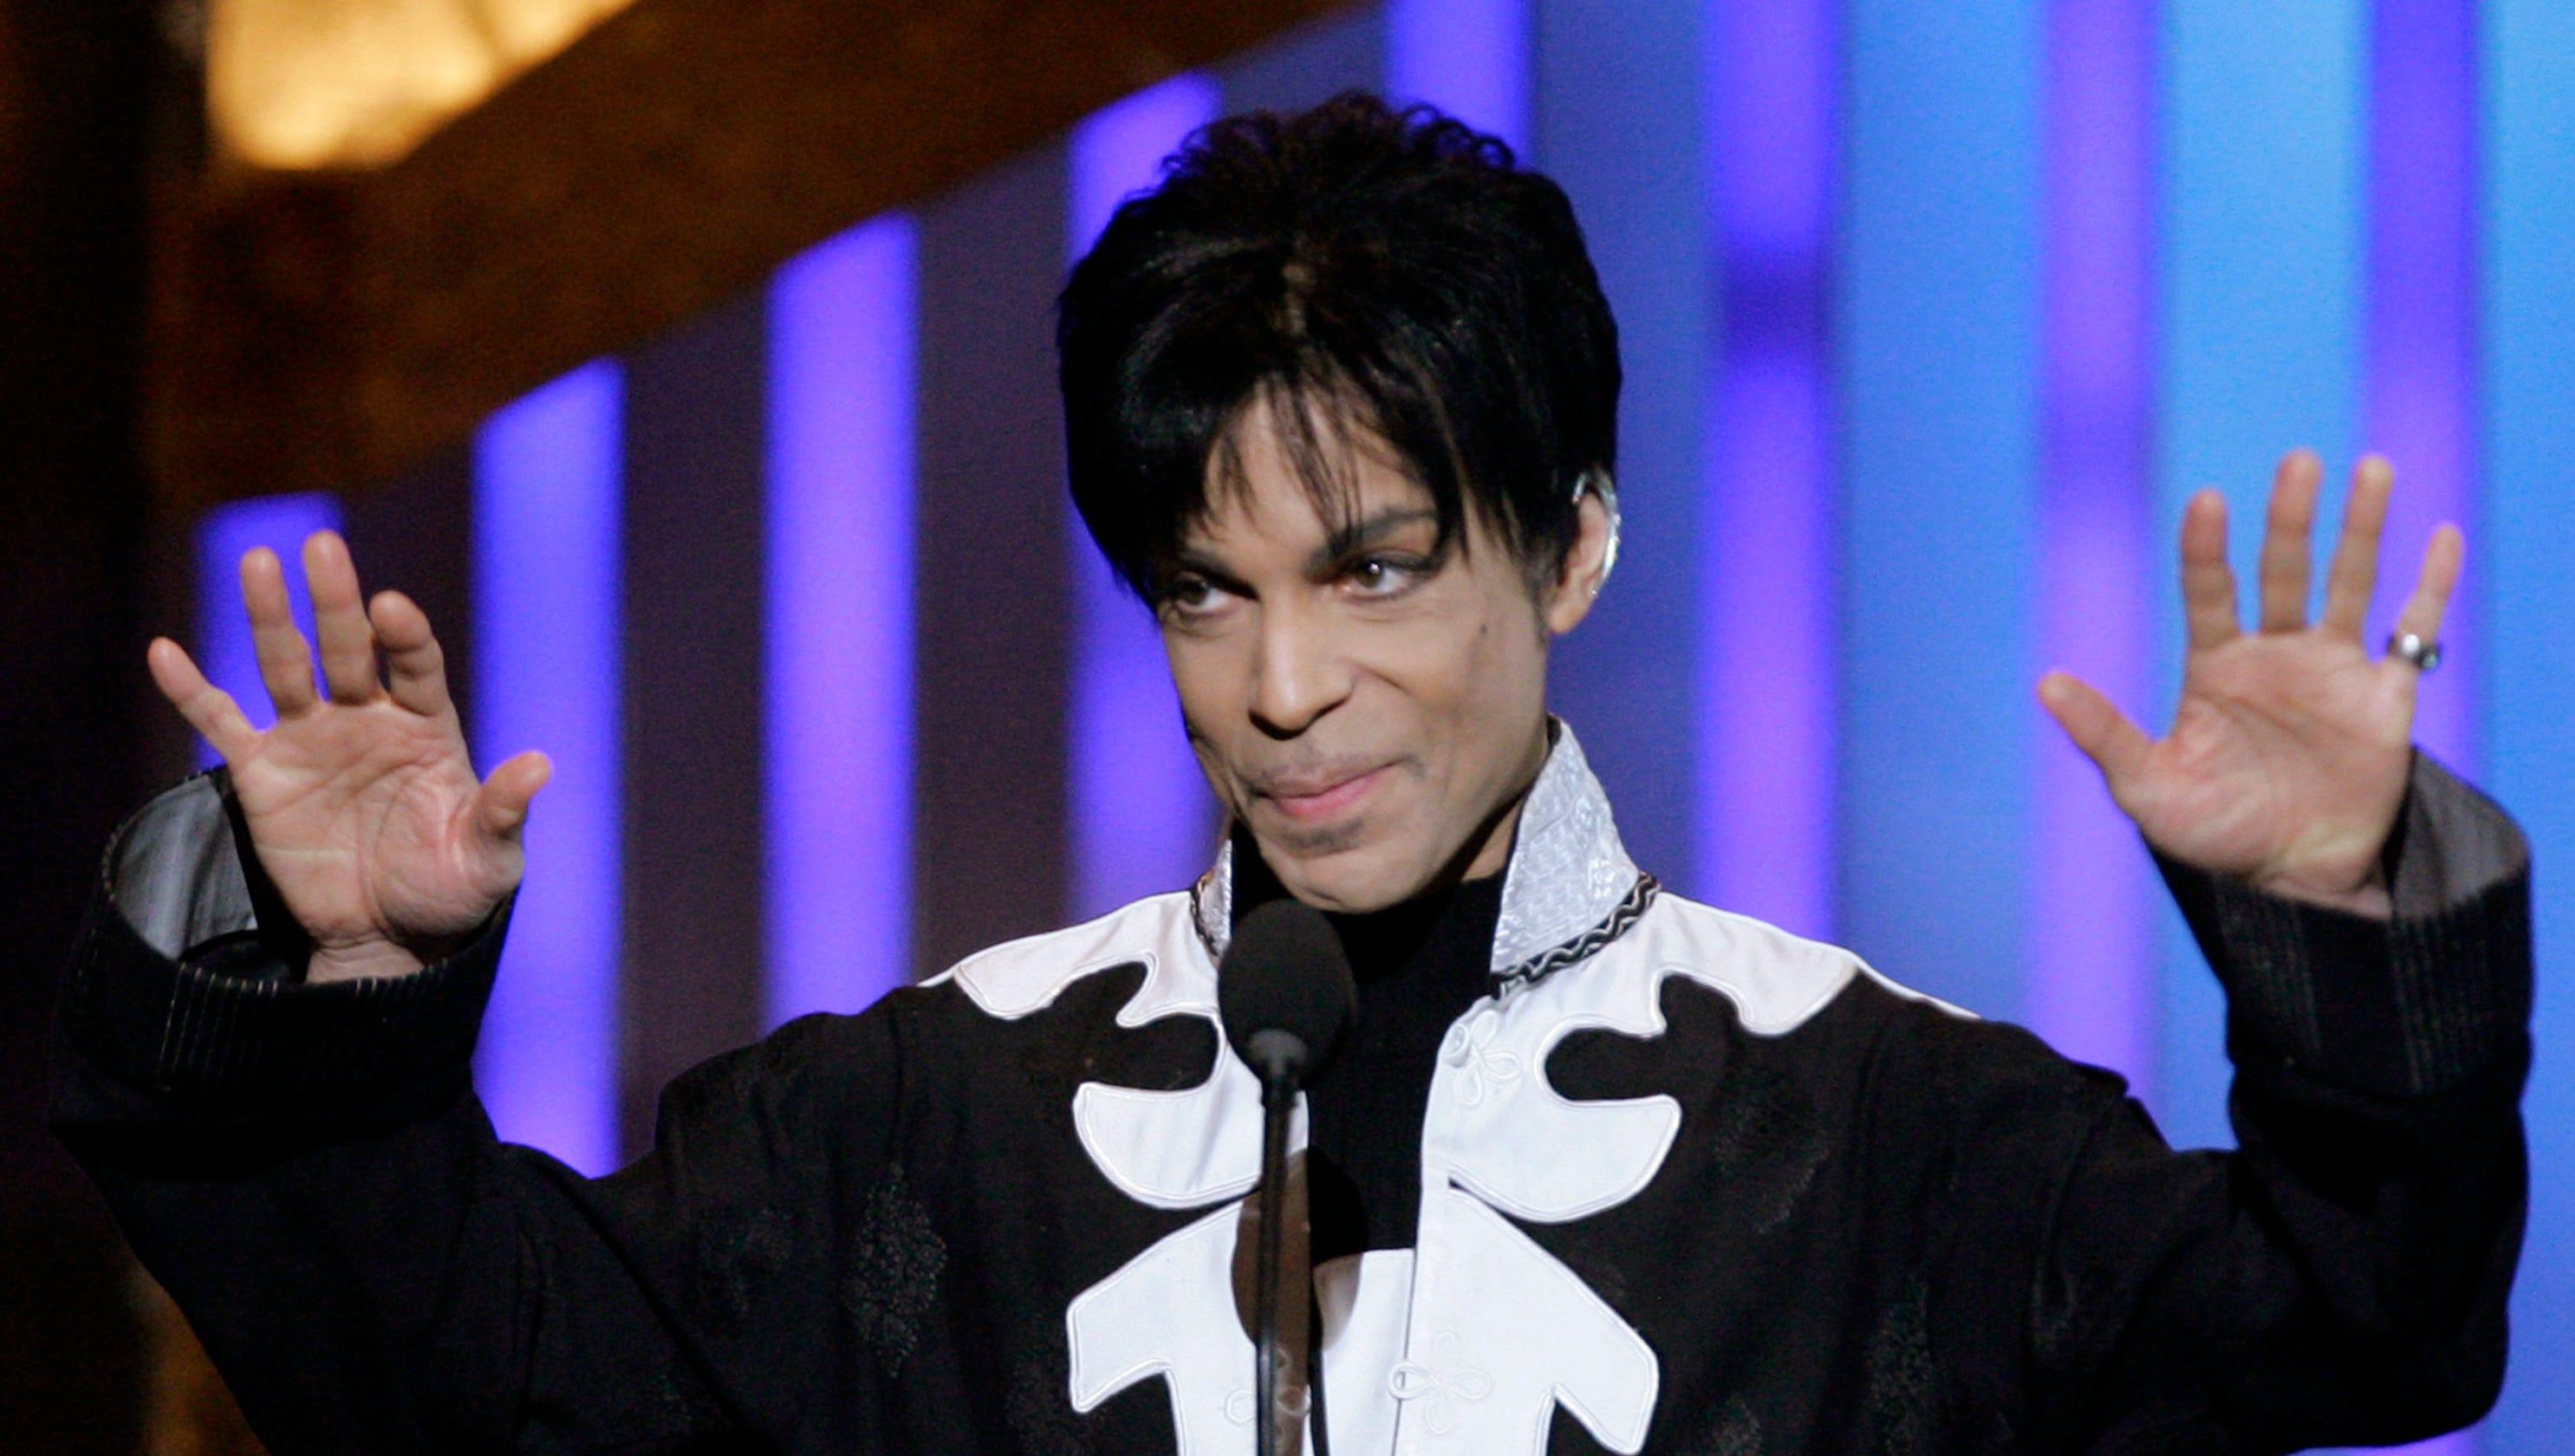 Prince-inspired movie musical to put 'Mamma Mia!' into 'Purple Rain'